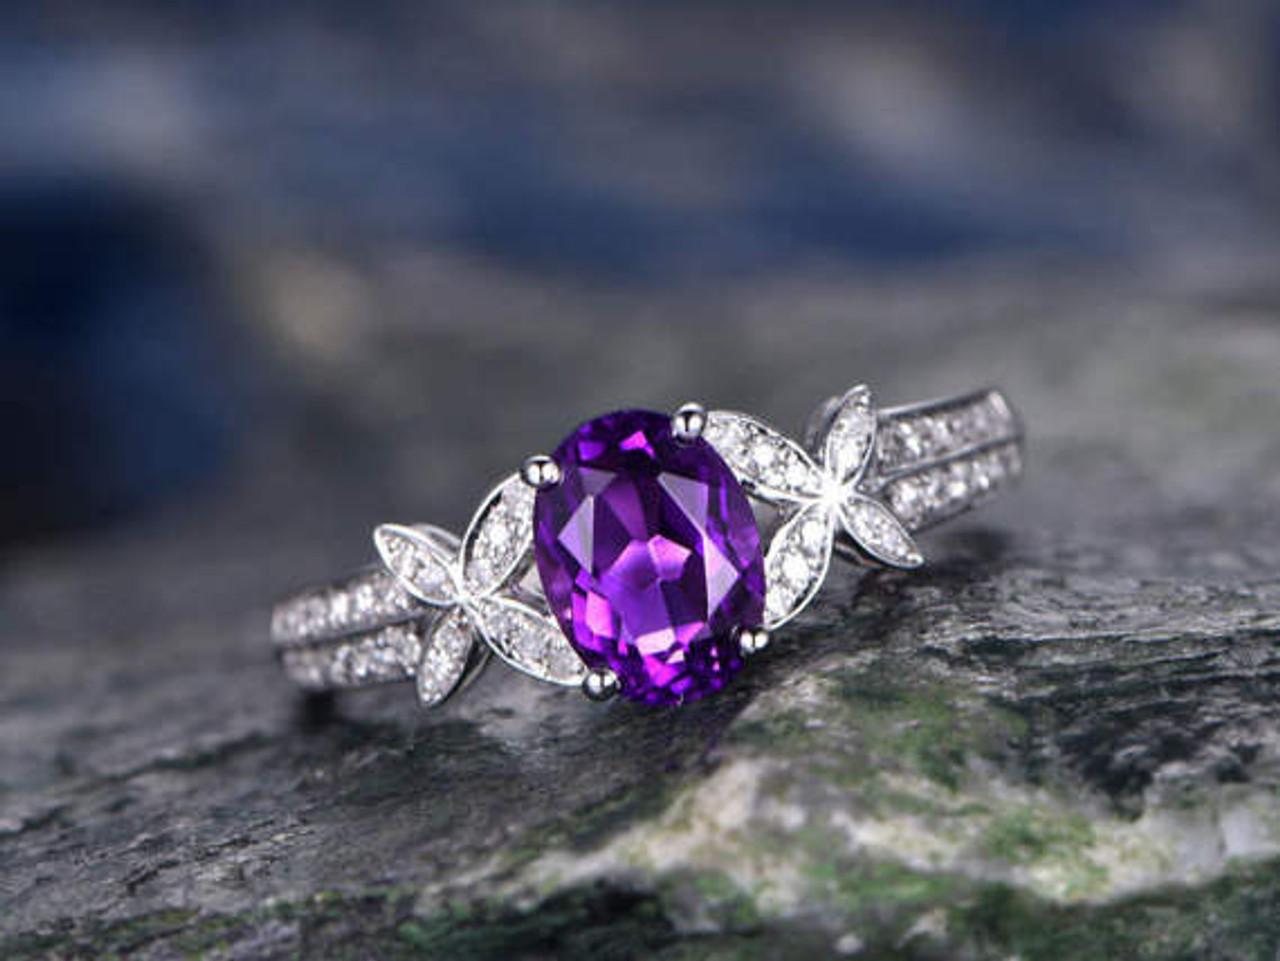 Purple Amethyst engagement ringSolid 14k White goldhandmade